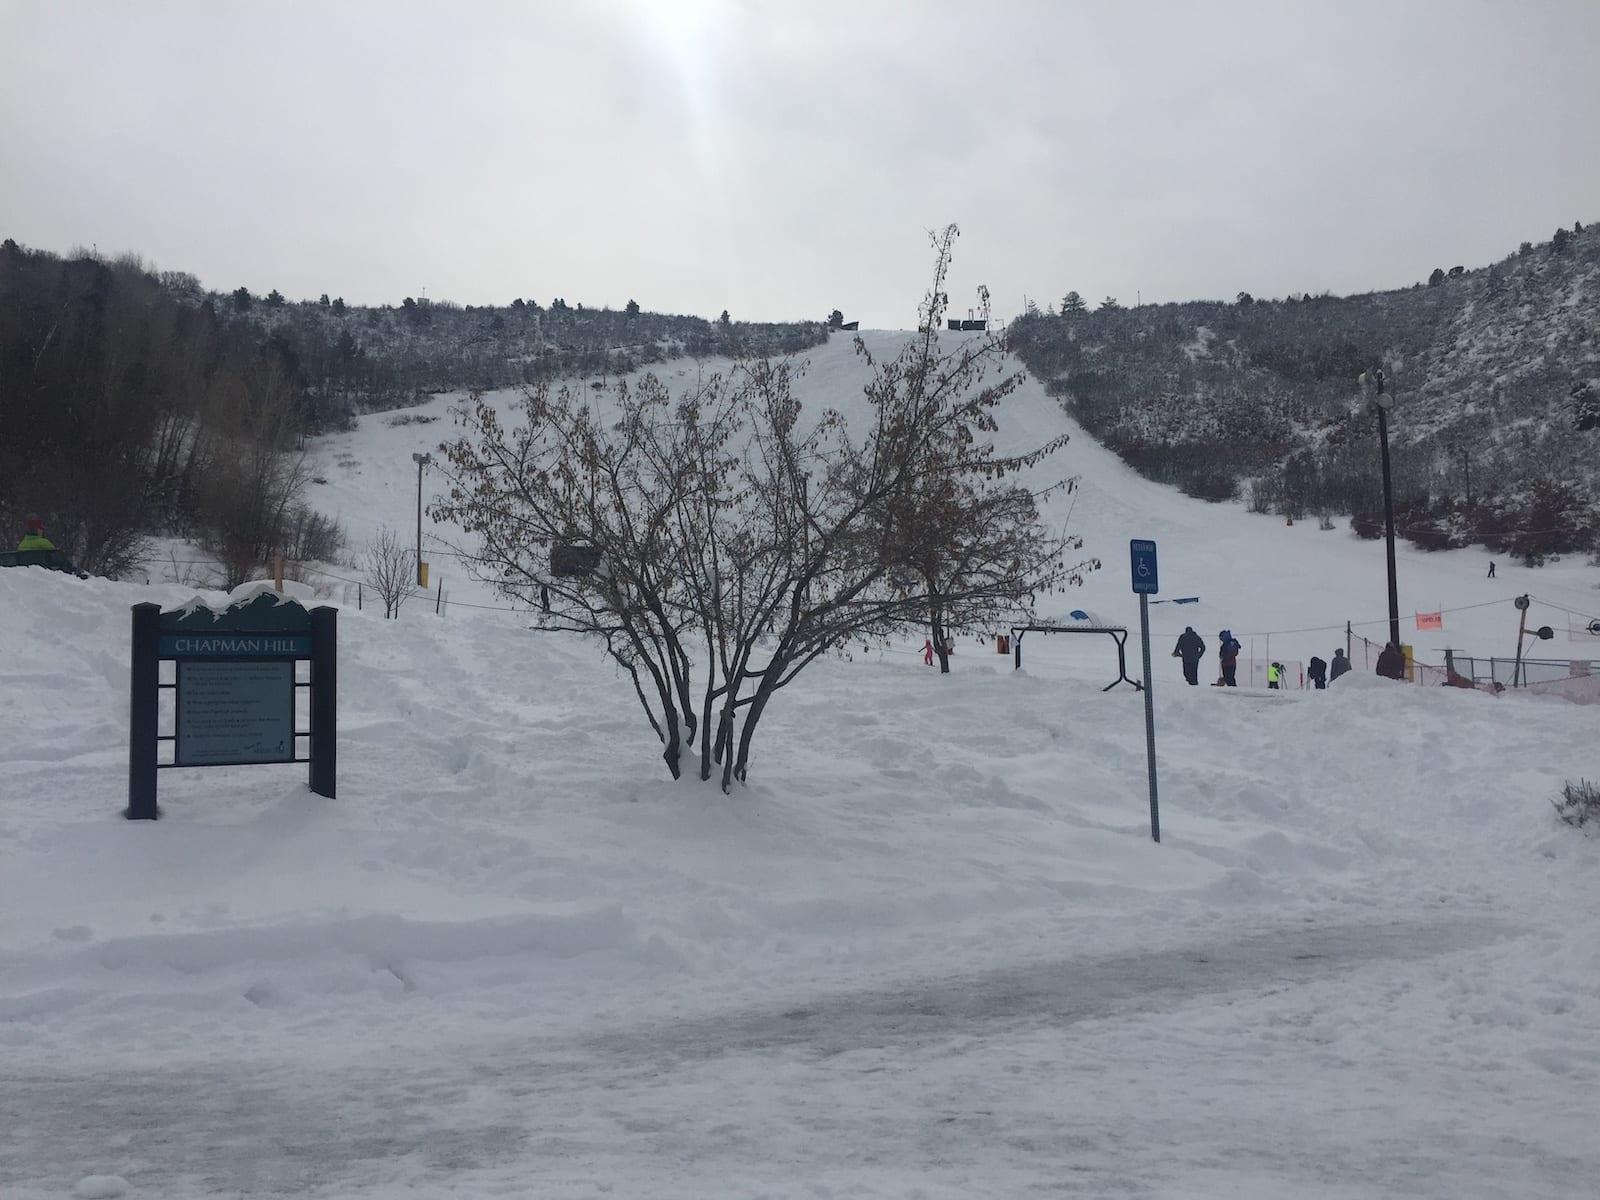 Chapman Hill Municipal Ski Area Durango Colorado